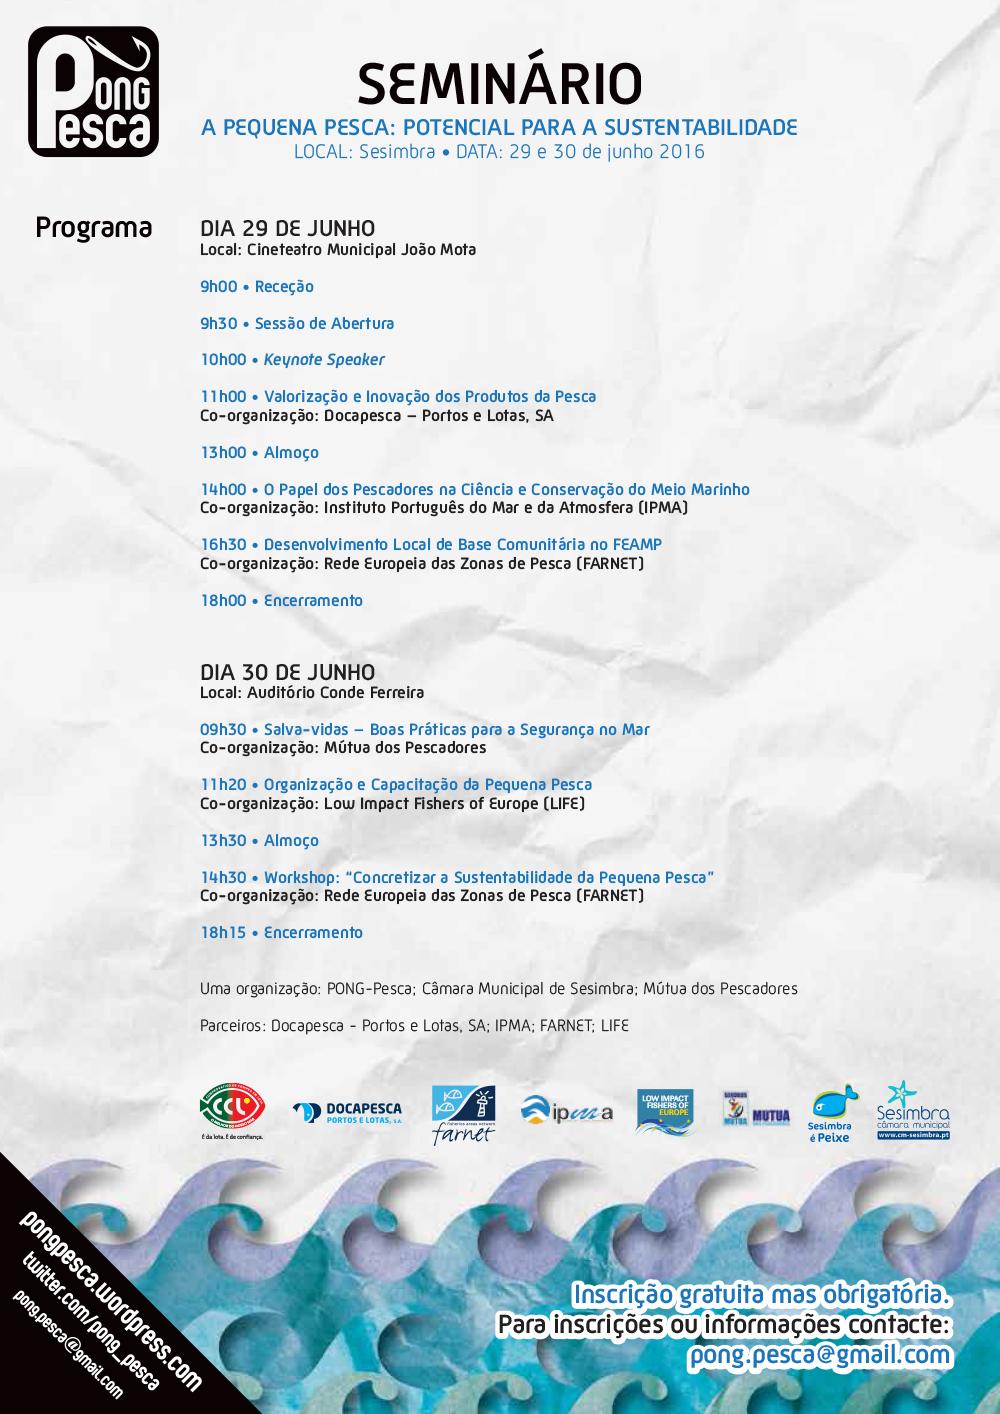 seminario-pong-16-copy